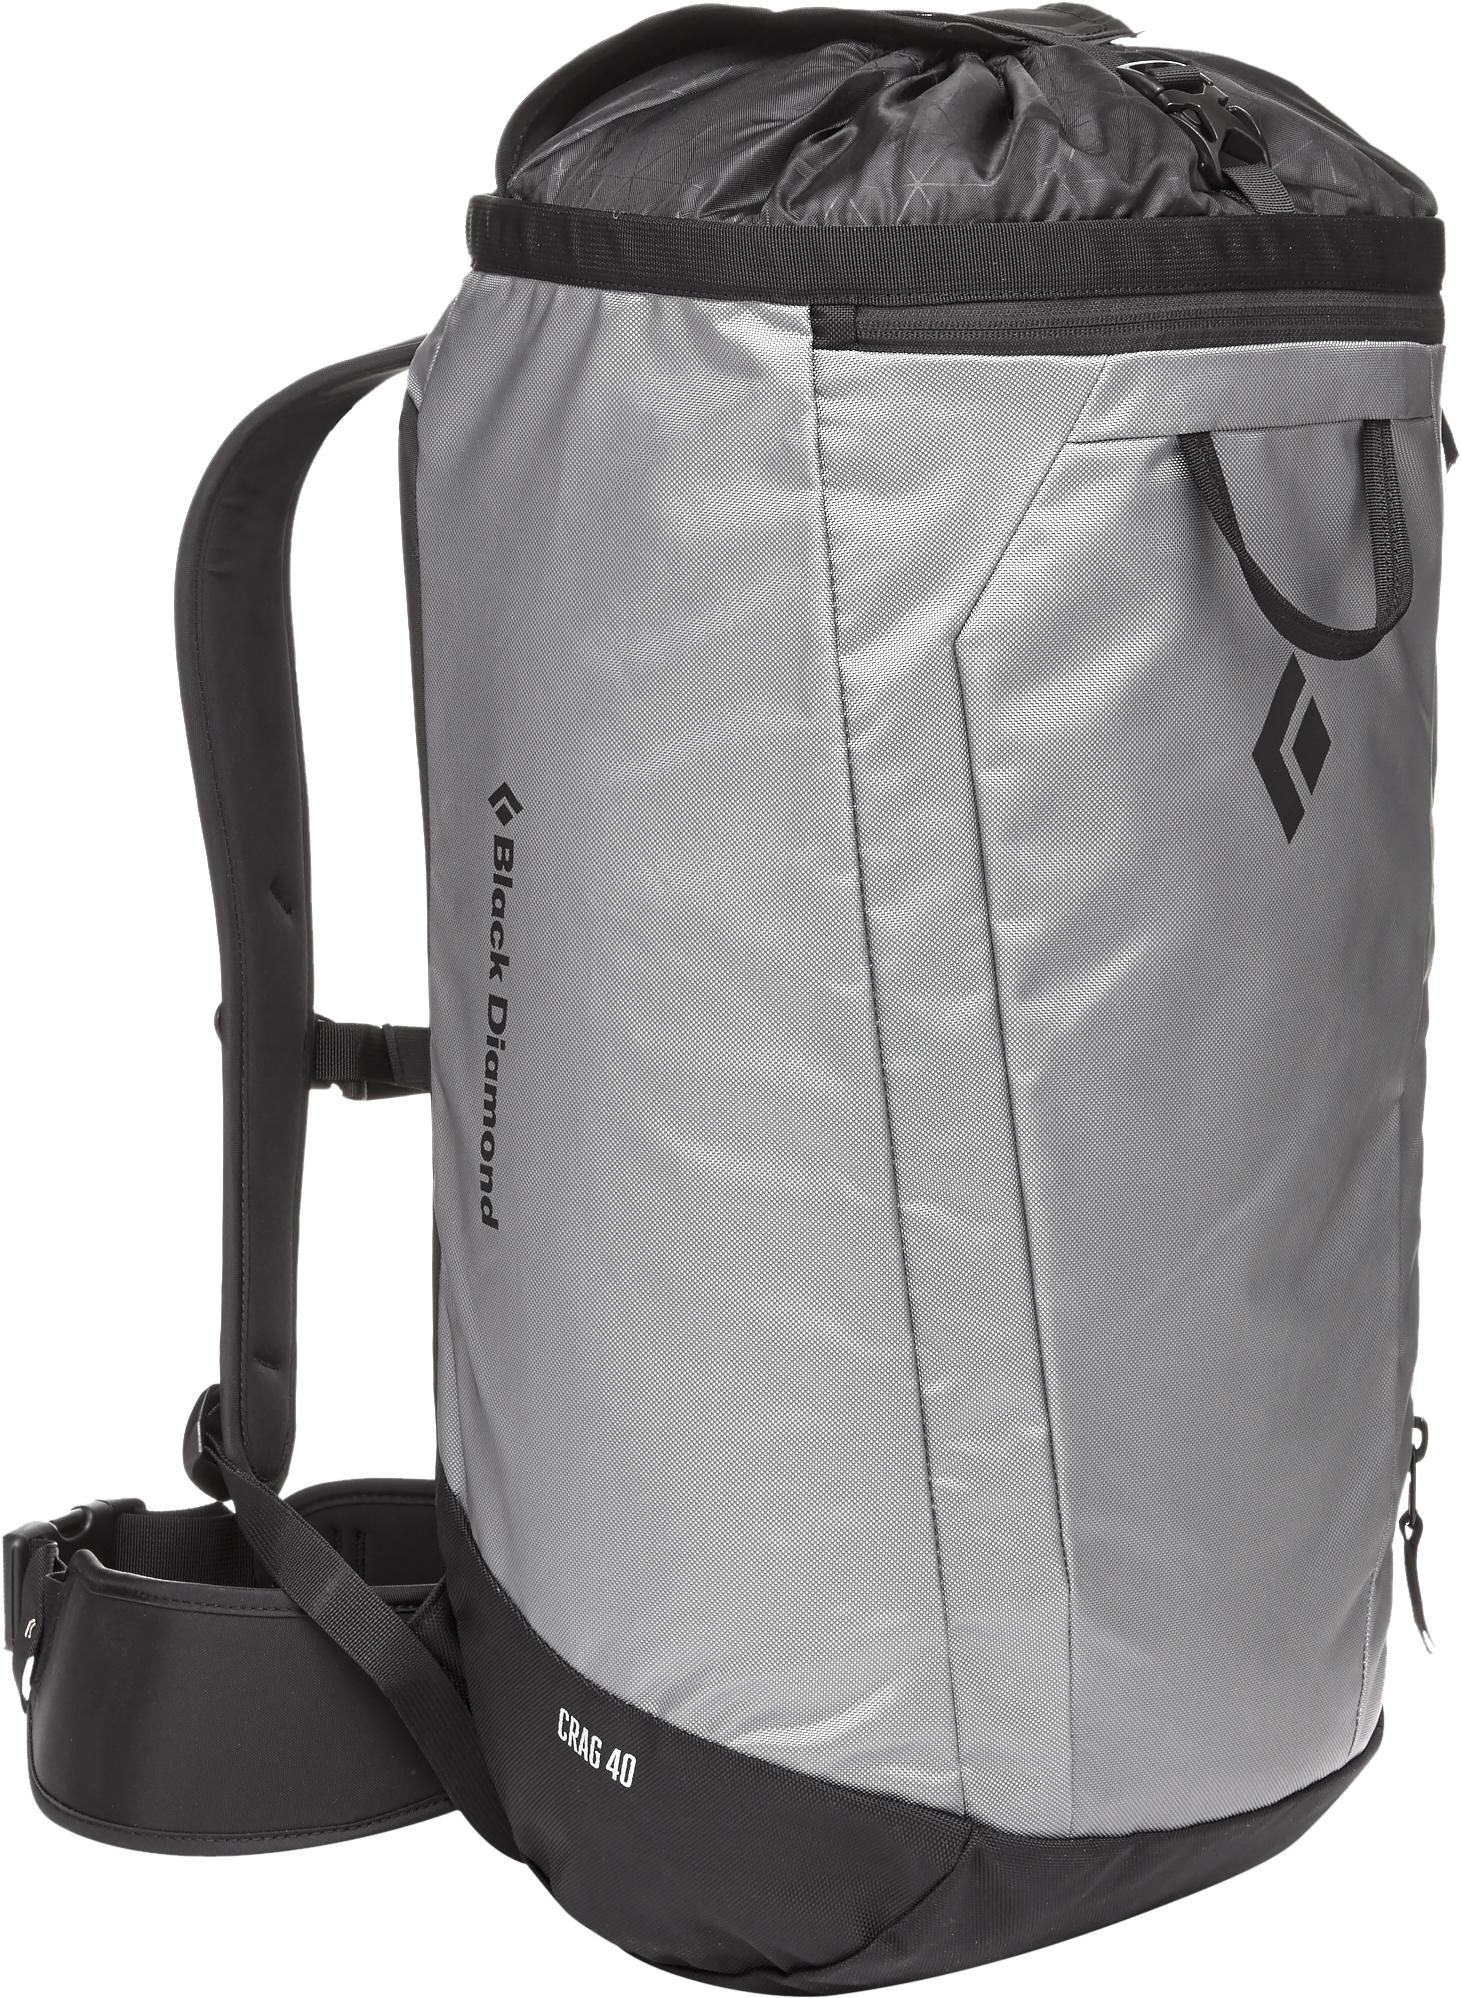 509920993d91 Black Diamond Crag 40 Backpack - Unisex